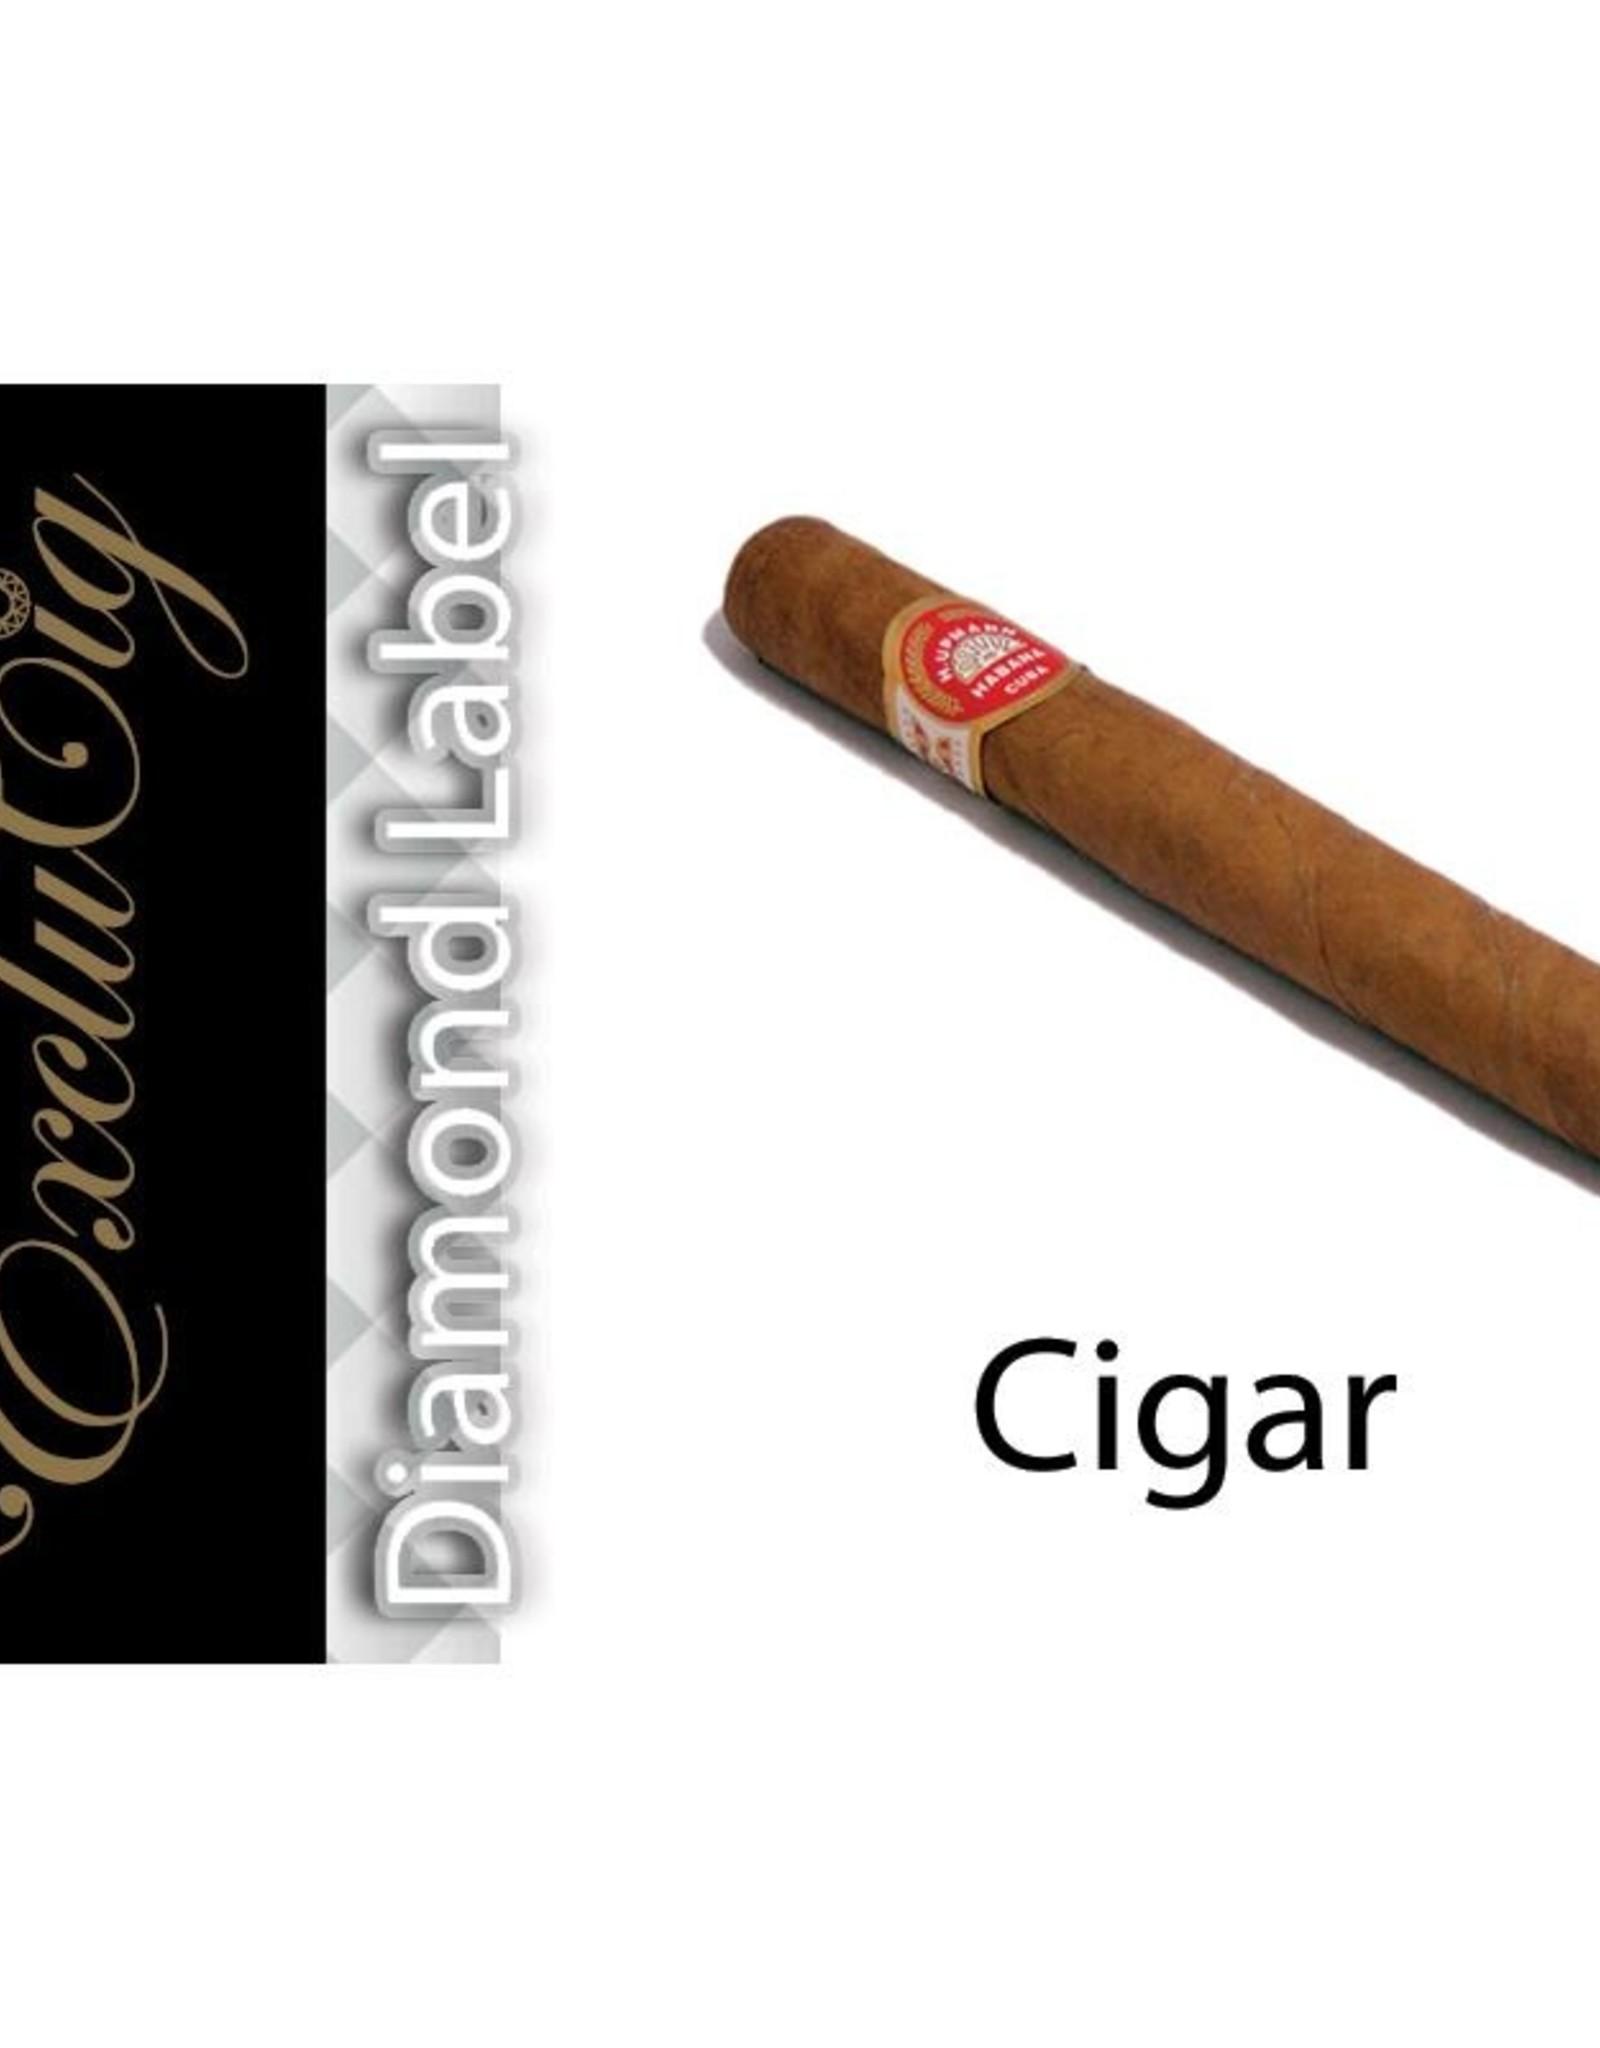 Exclucig Exclucig Diamond Label E-liquid Cigar 18 mg Nicotine